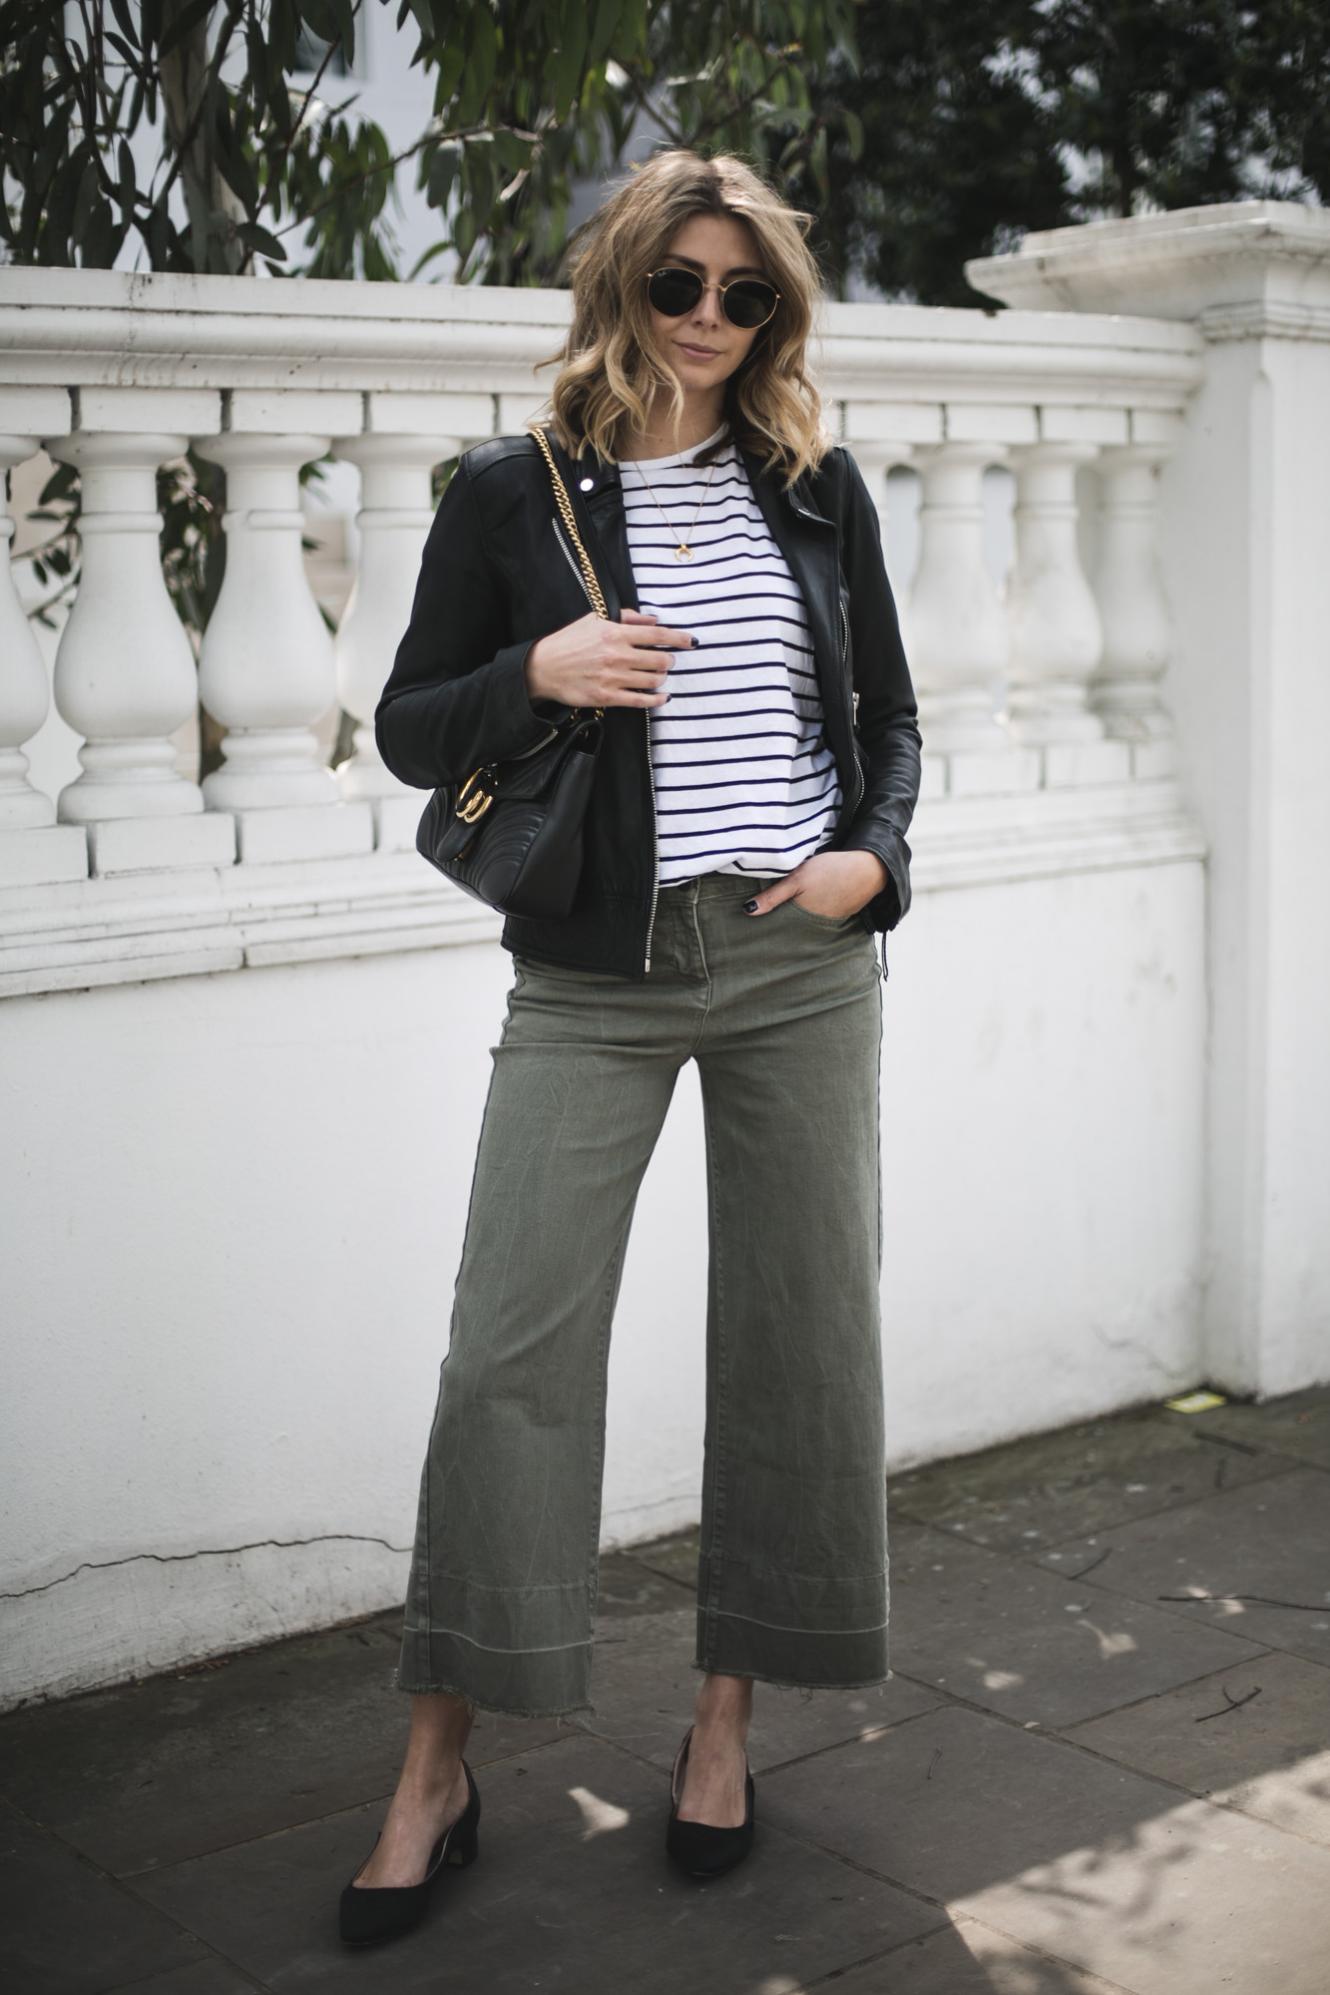 Emma Hill of EJSTYLE wears black leather biker jacket, stripe t-shirt, wide leg khaki trousers, Gucci Marmont bag, low block heel pumps, Spring outfit